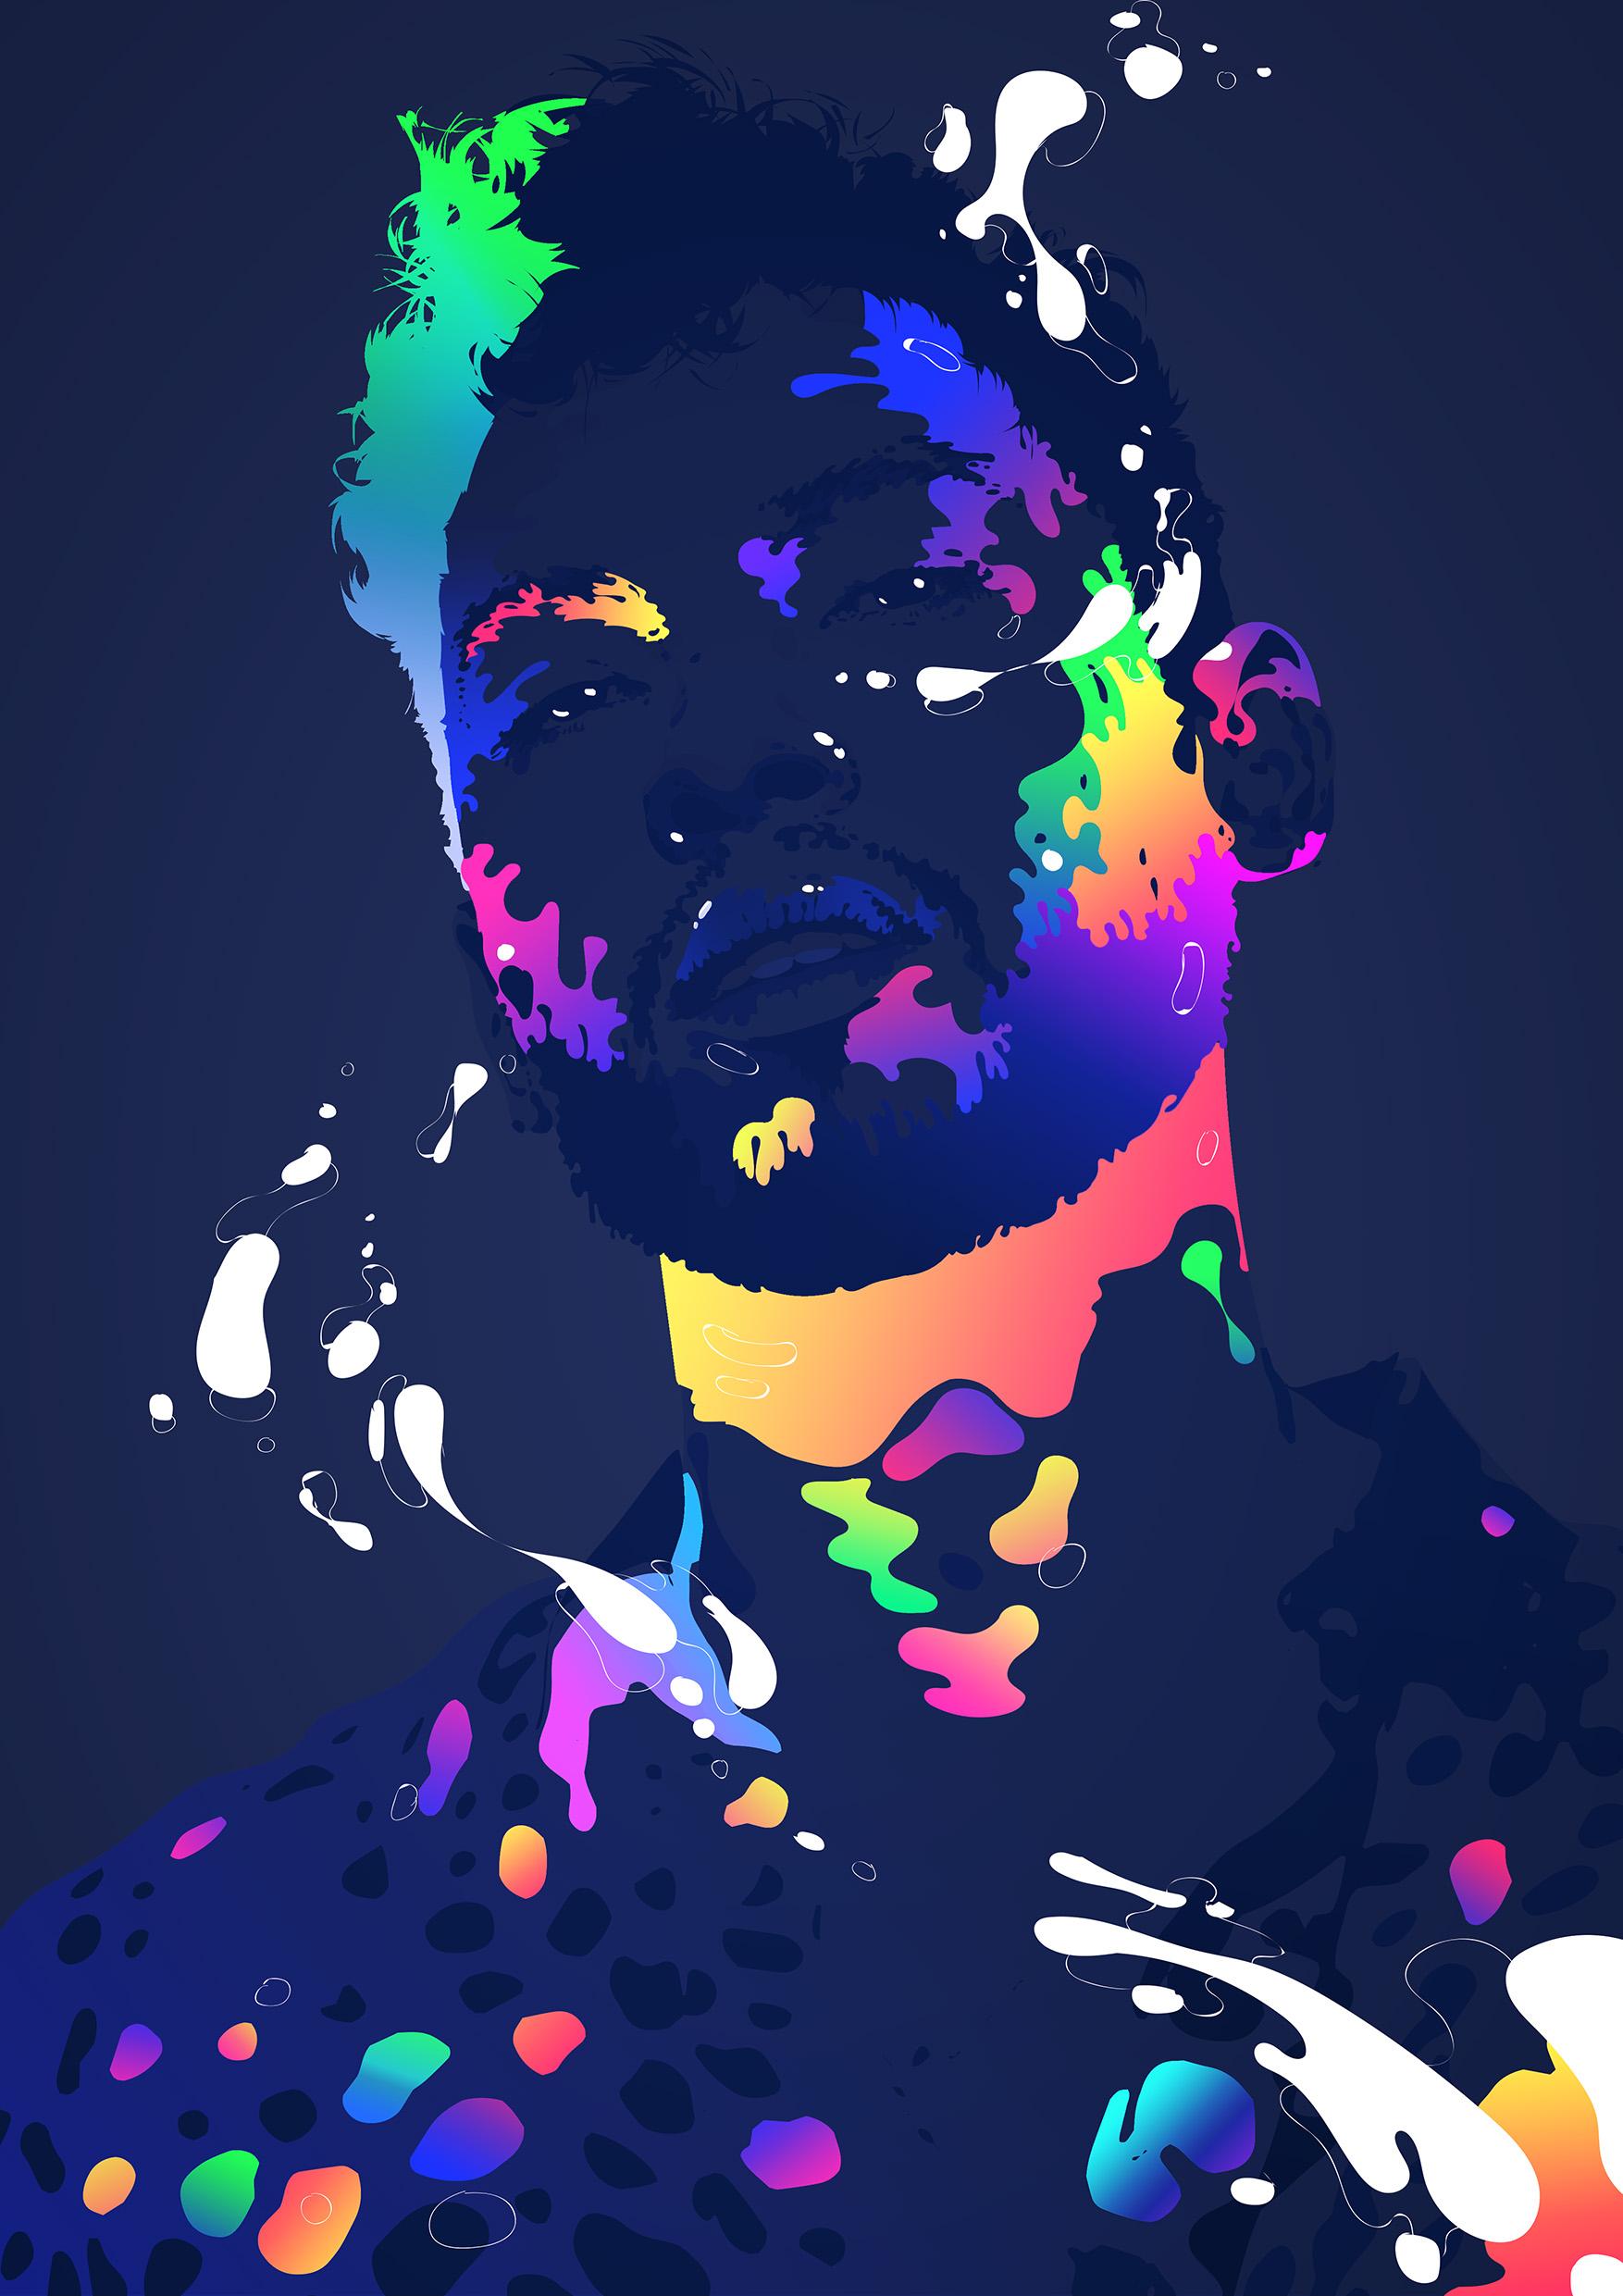 Miguel-night-net